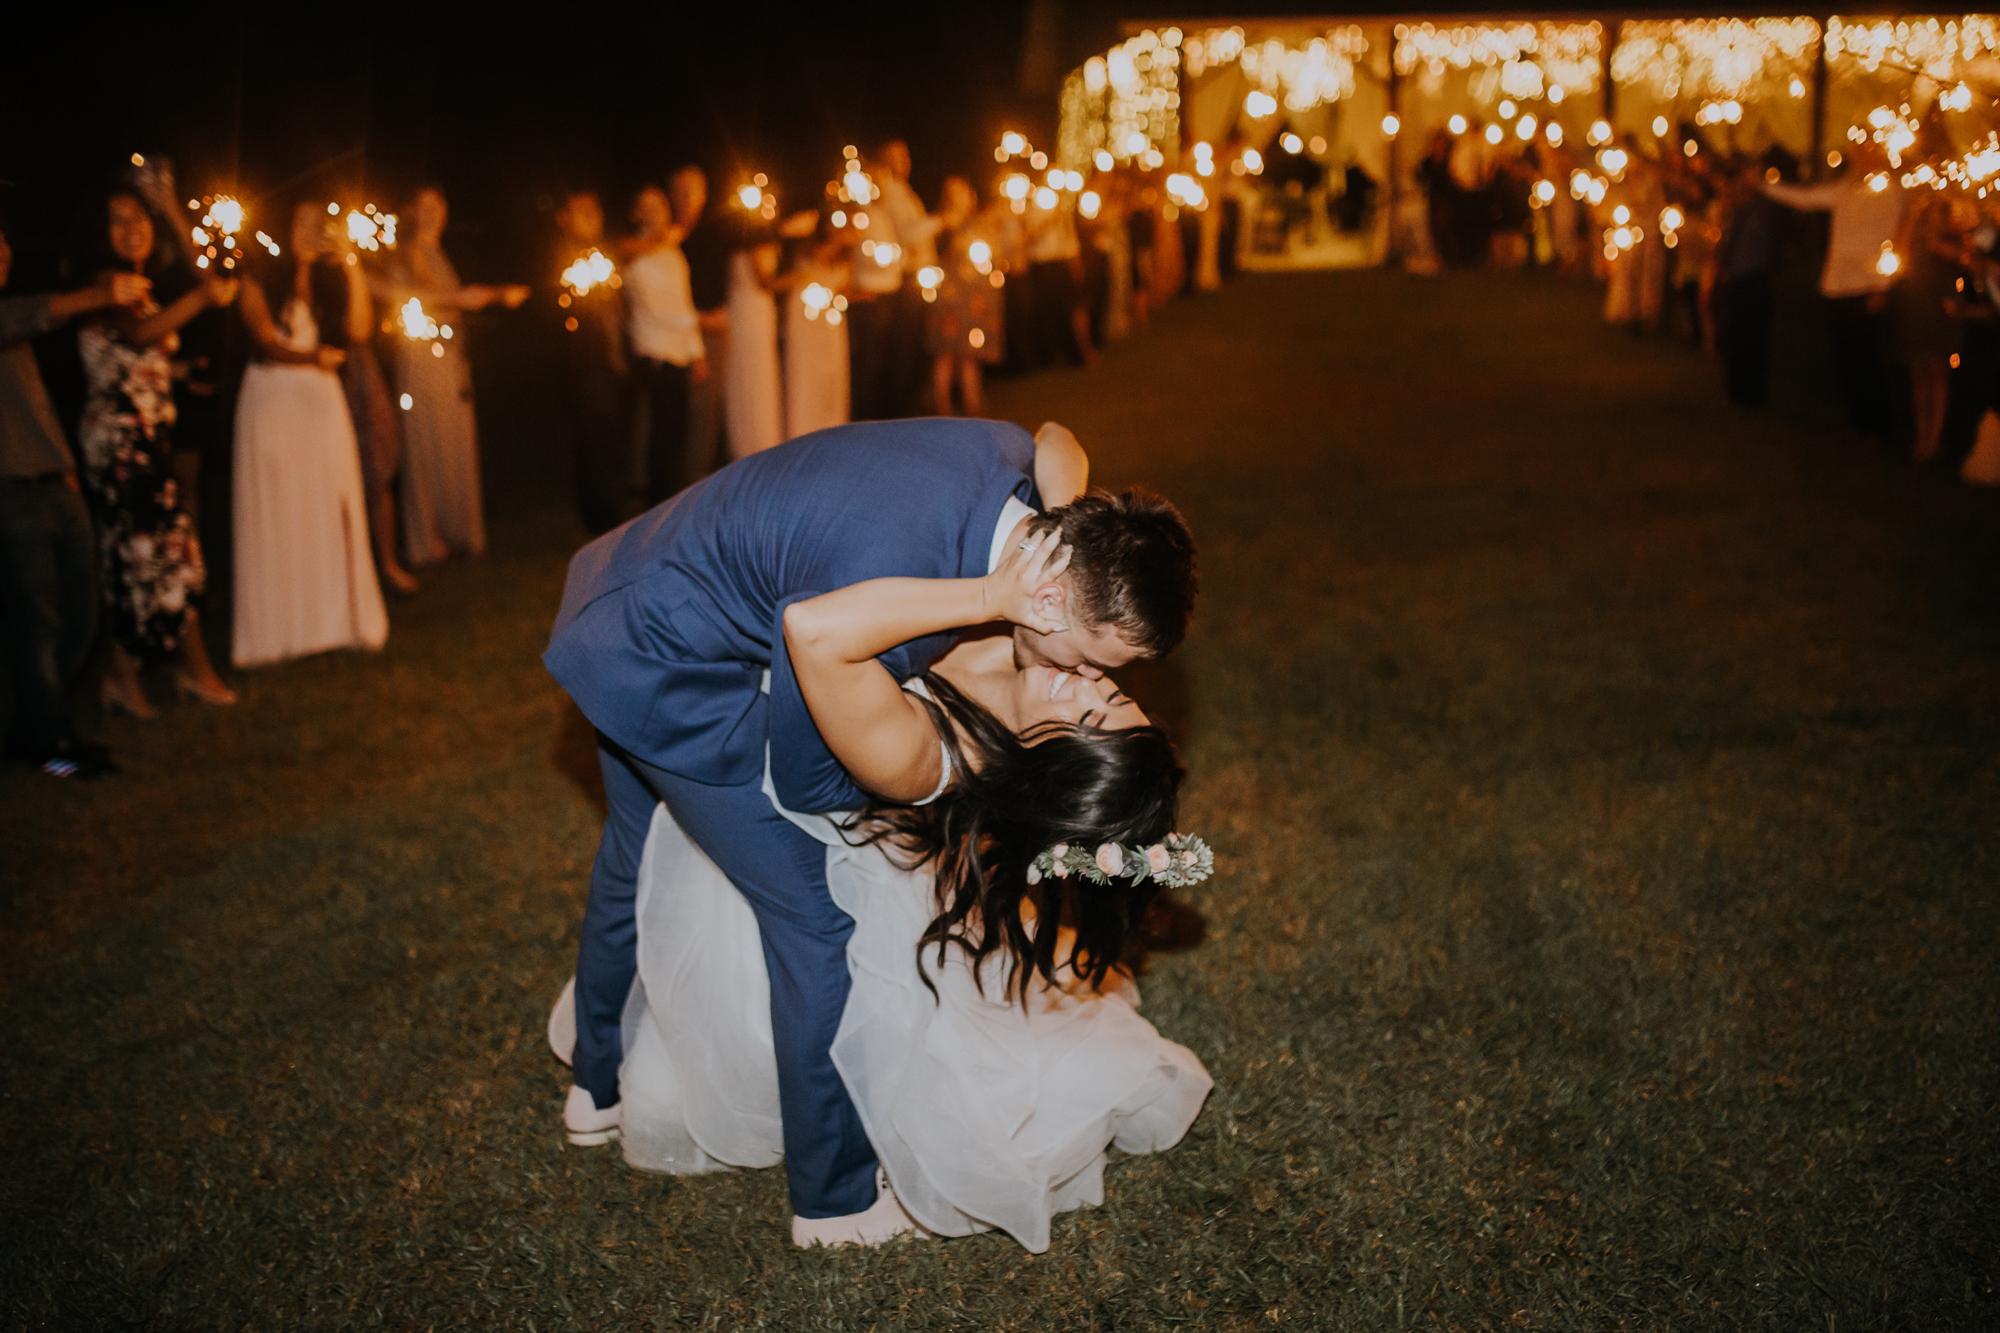 sparkler exit | wedding sparkler exit | romantic sparkler exit | outdoor Florida wedding | sarasota wedding | last kiss | dip and kiss